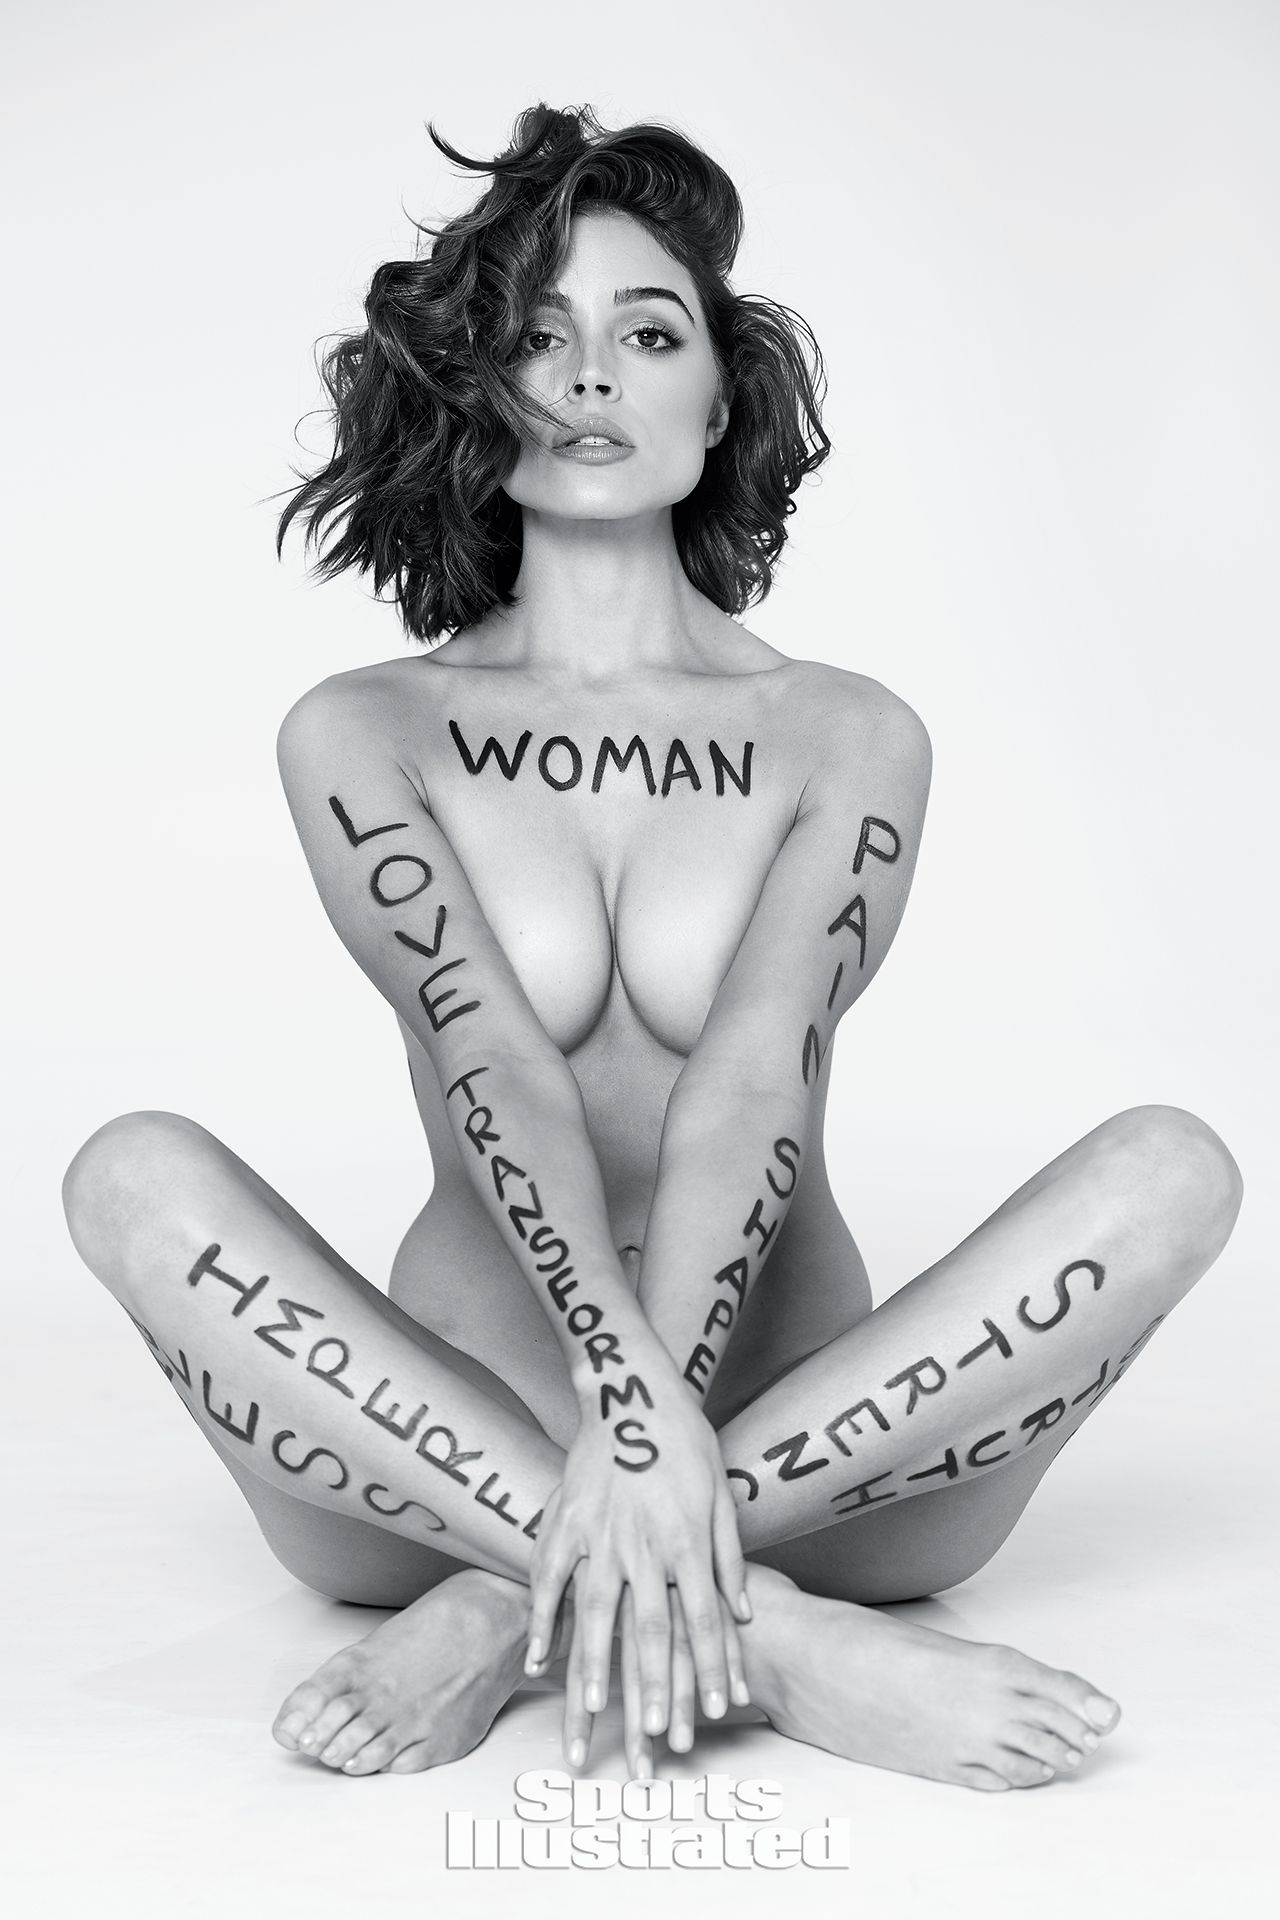 Virgin sex girl photo